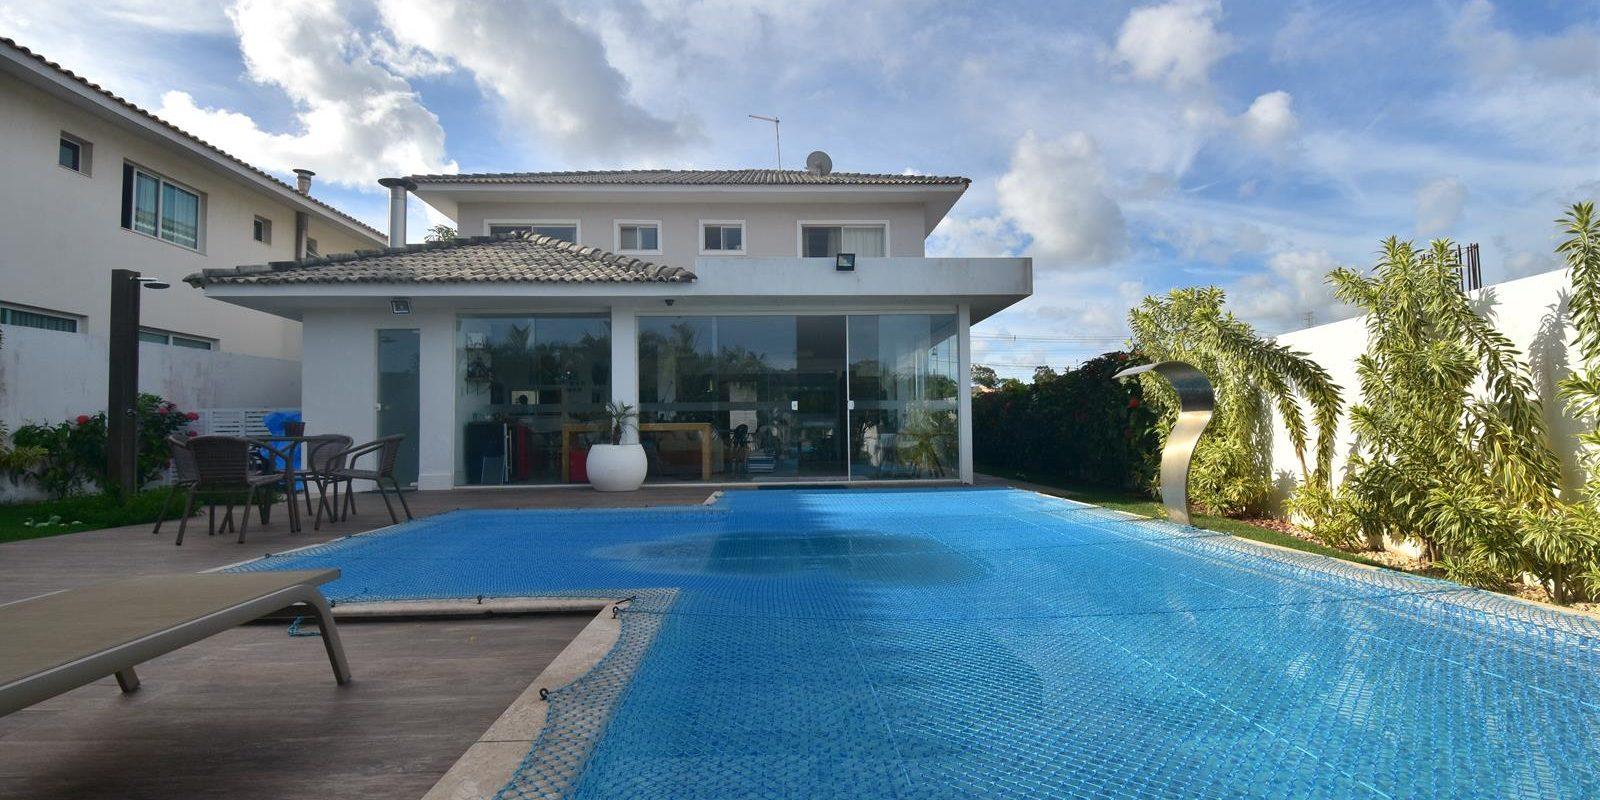 Ótima casa a venda Alphaville Salvador 2